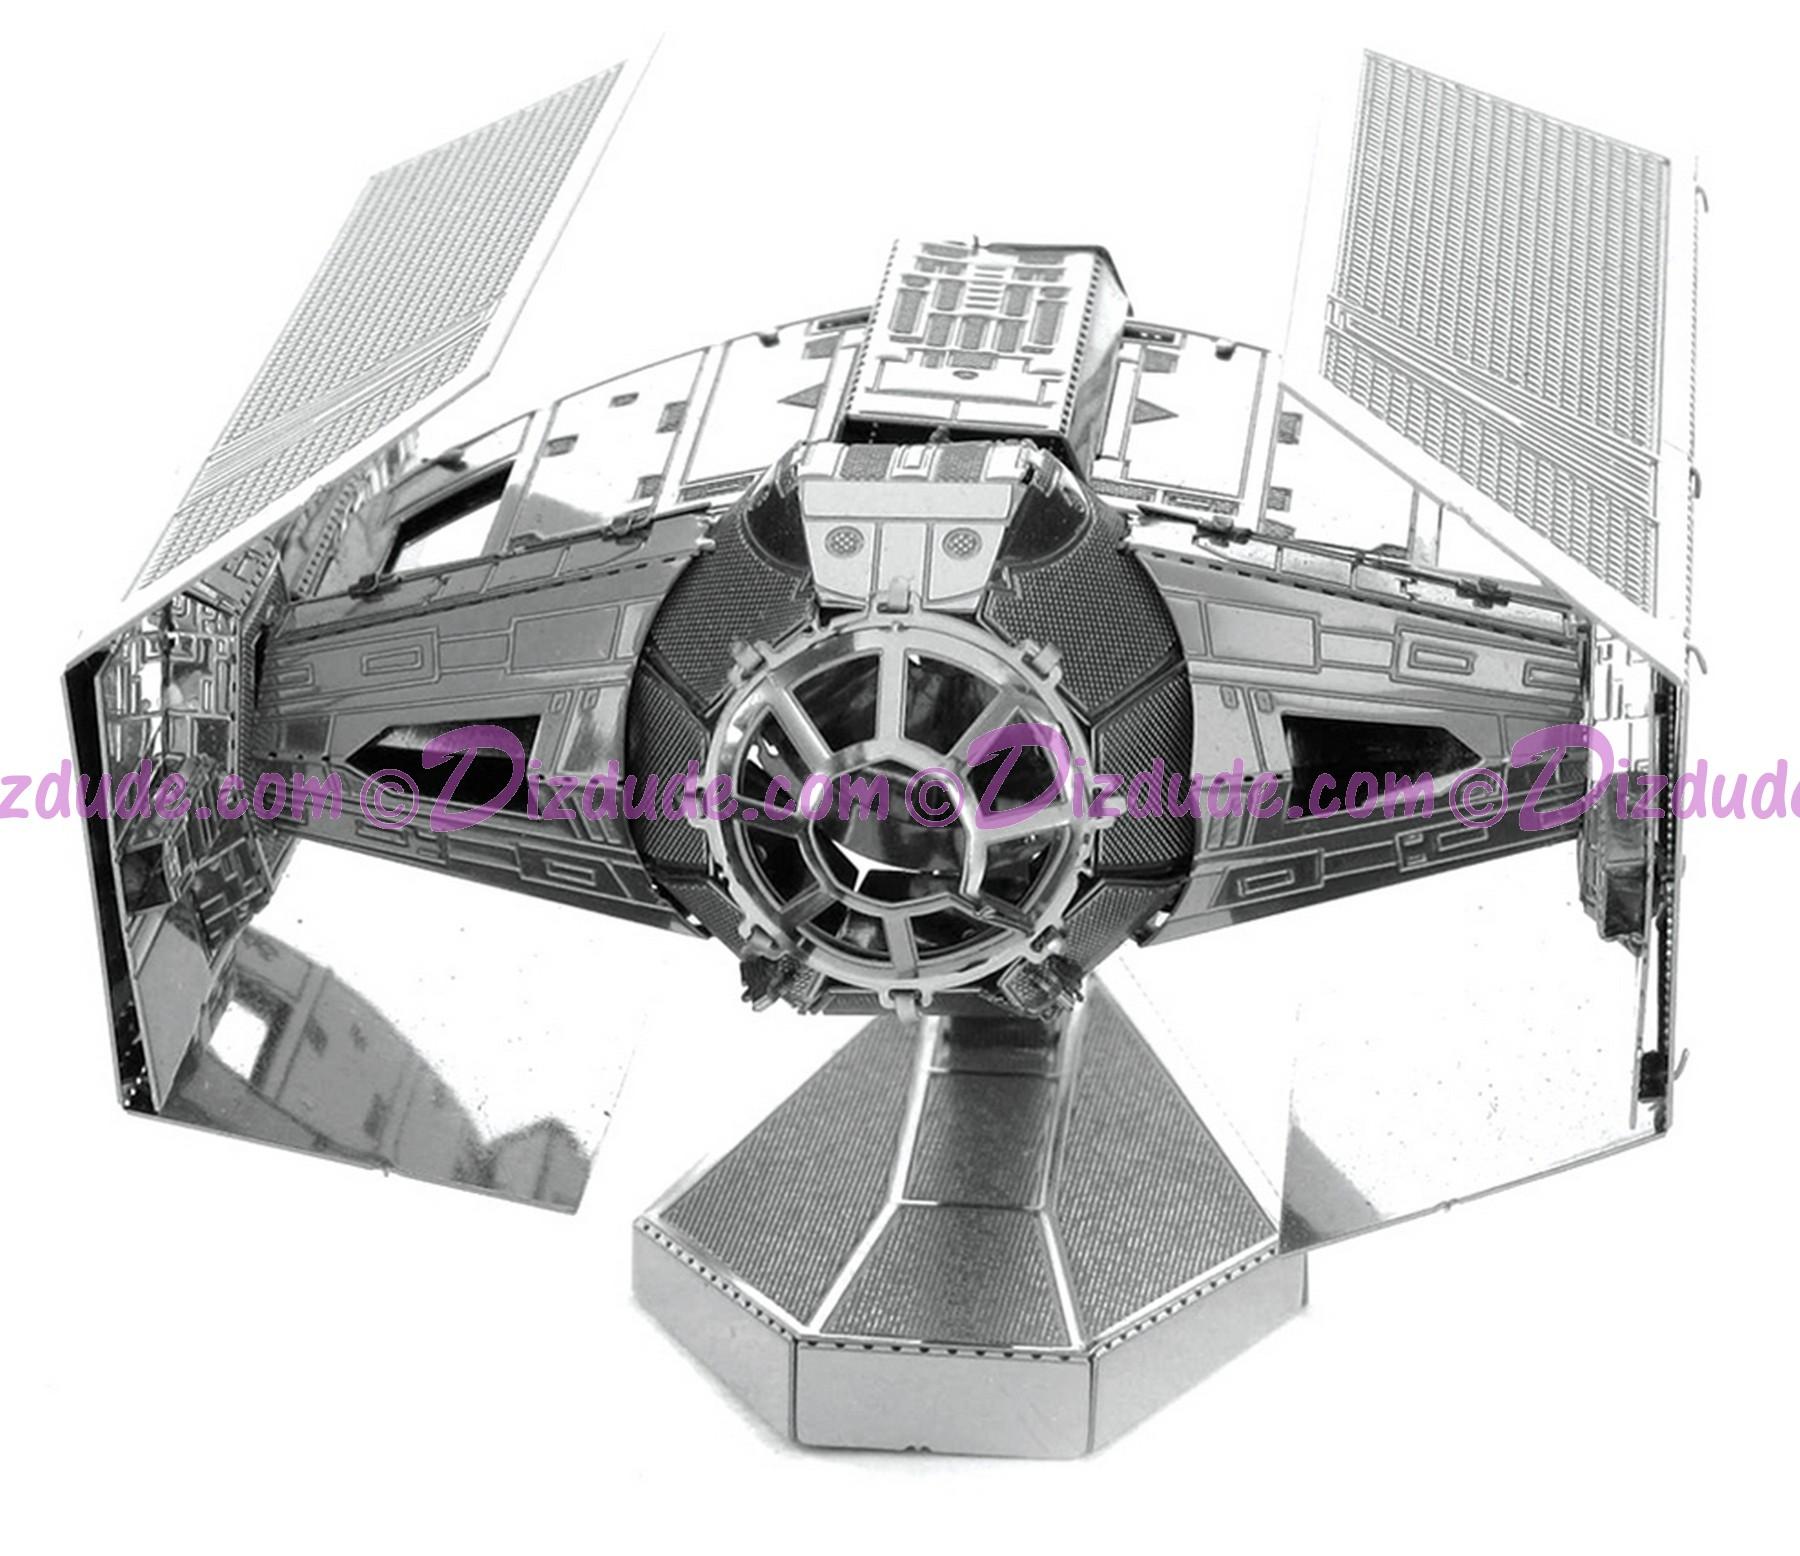 Disney Star Wars Darth Vader's TIE Fighter 3D Metal Model Kit © Dizdude.com